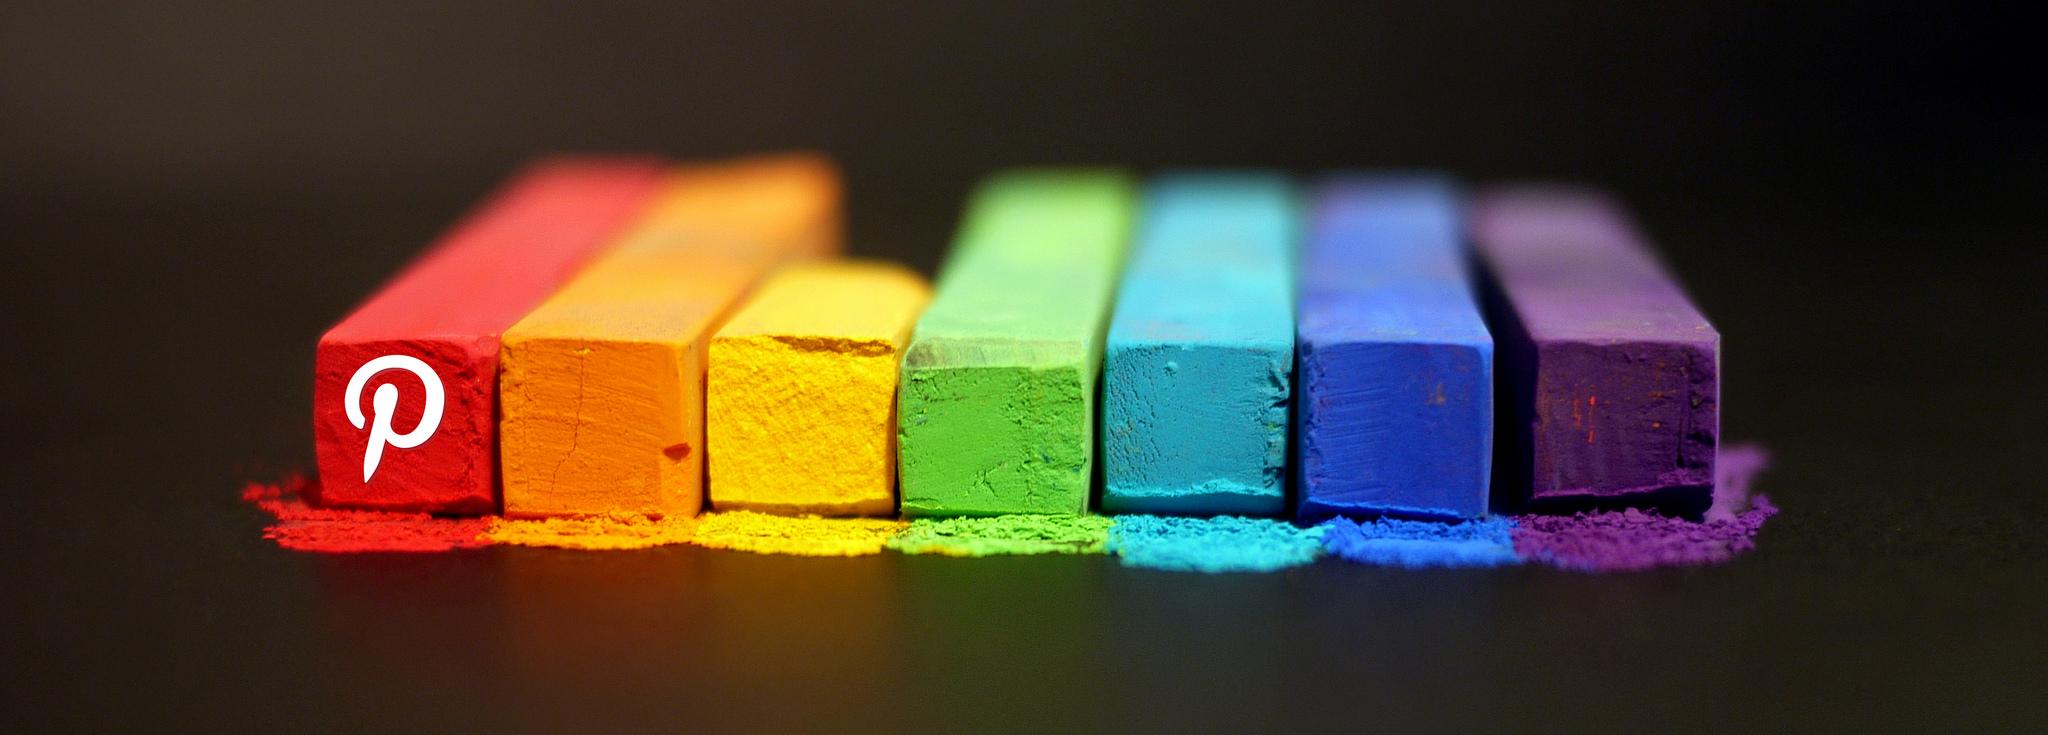 Coloured Chalks Showing Pinterest